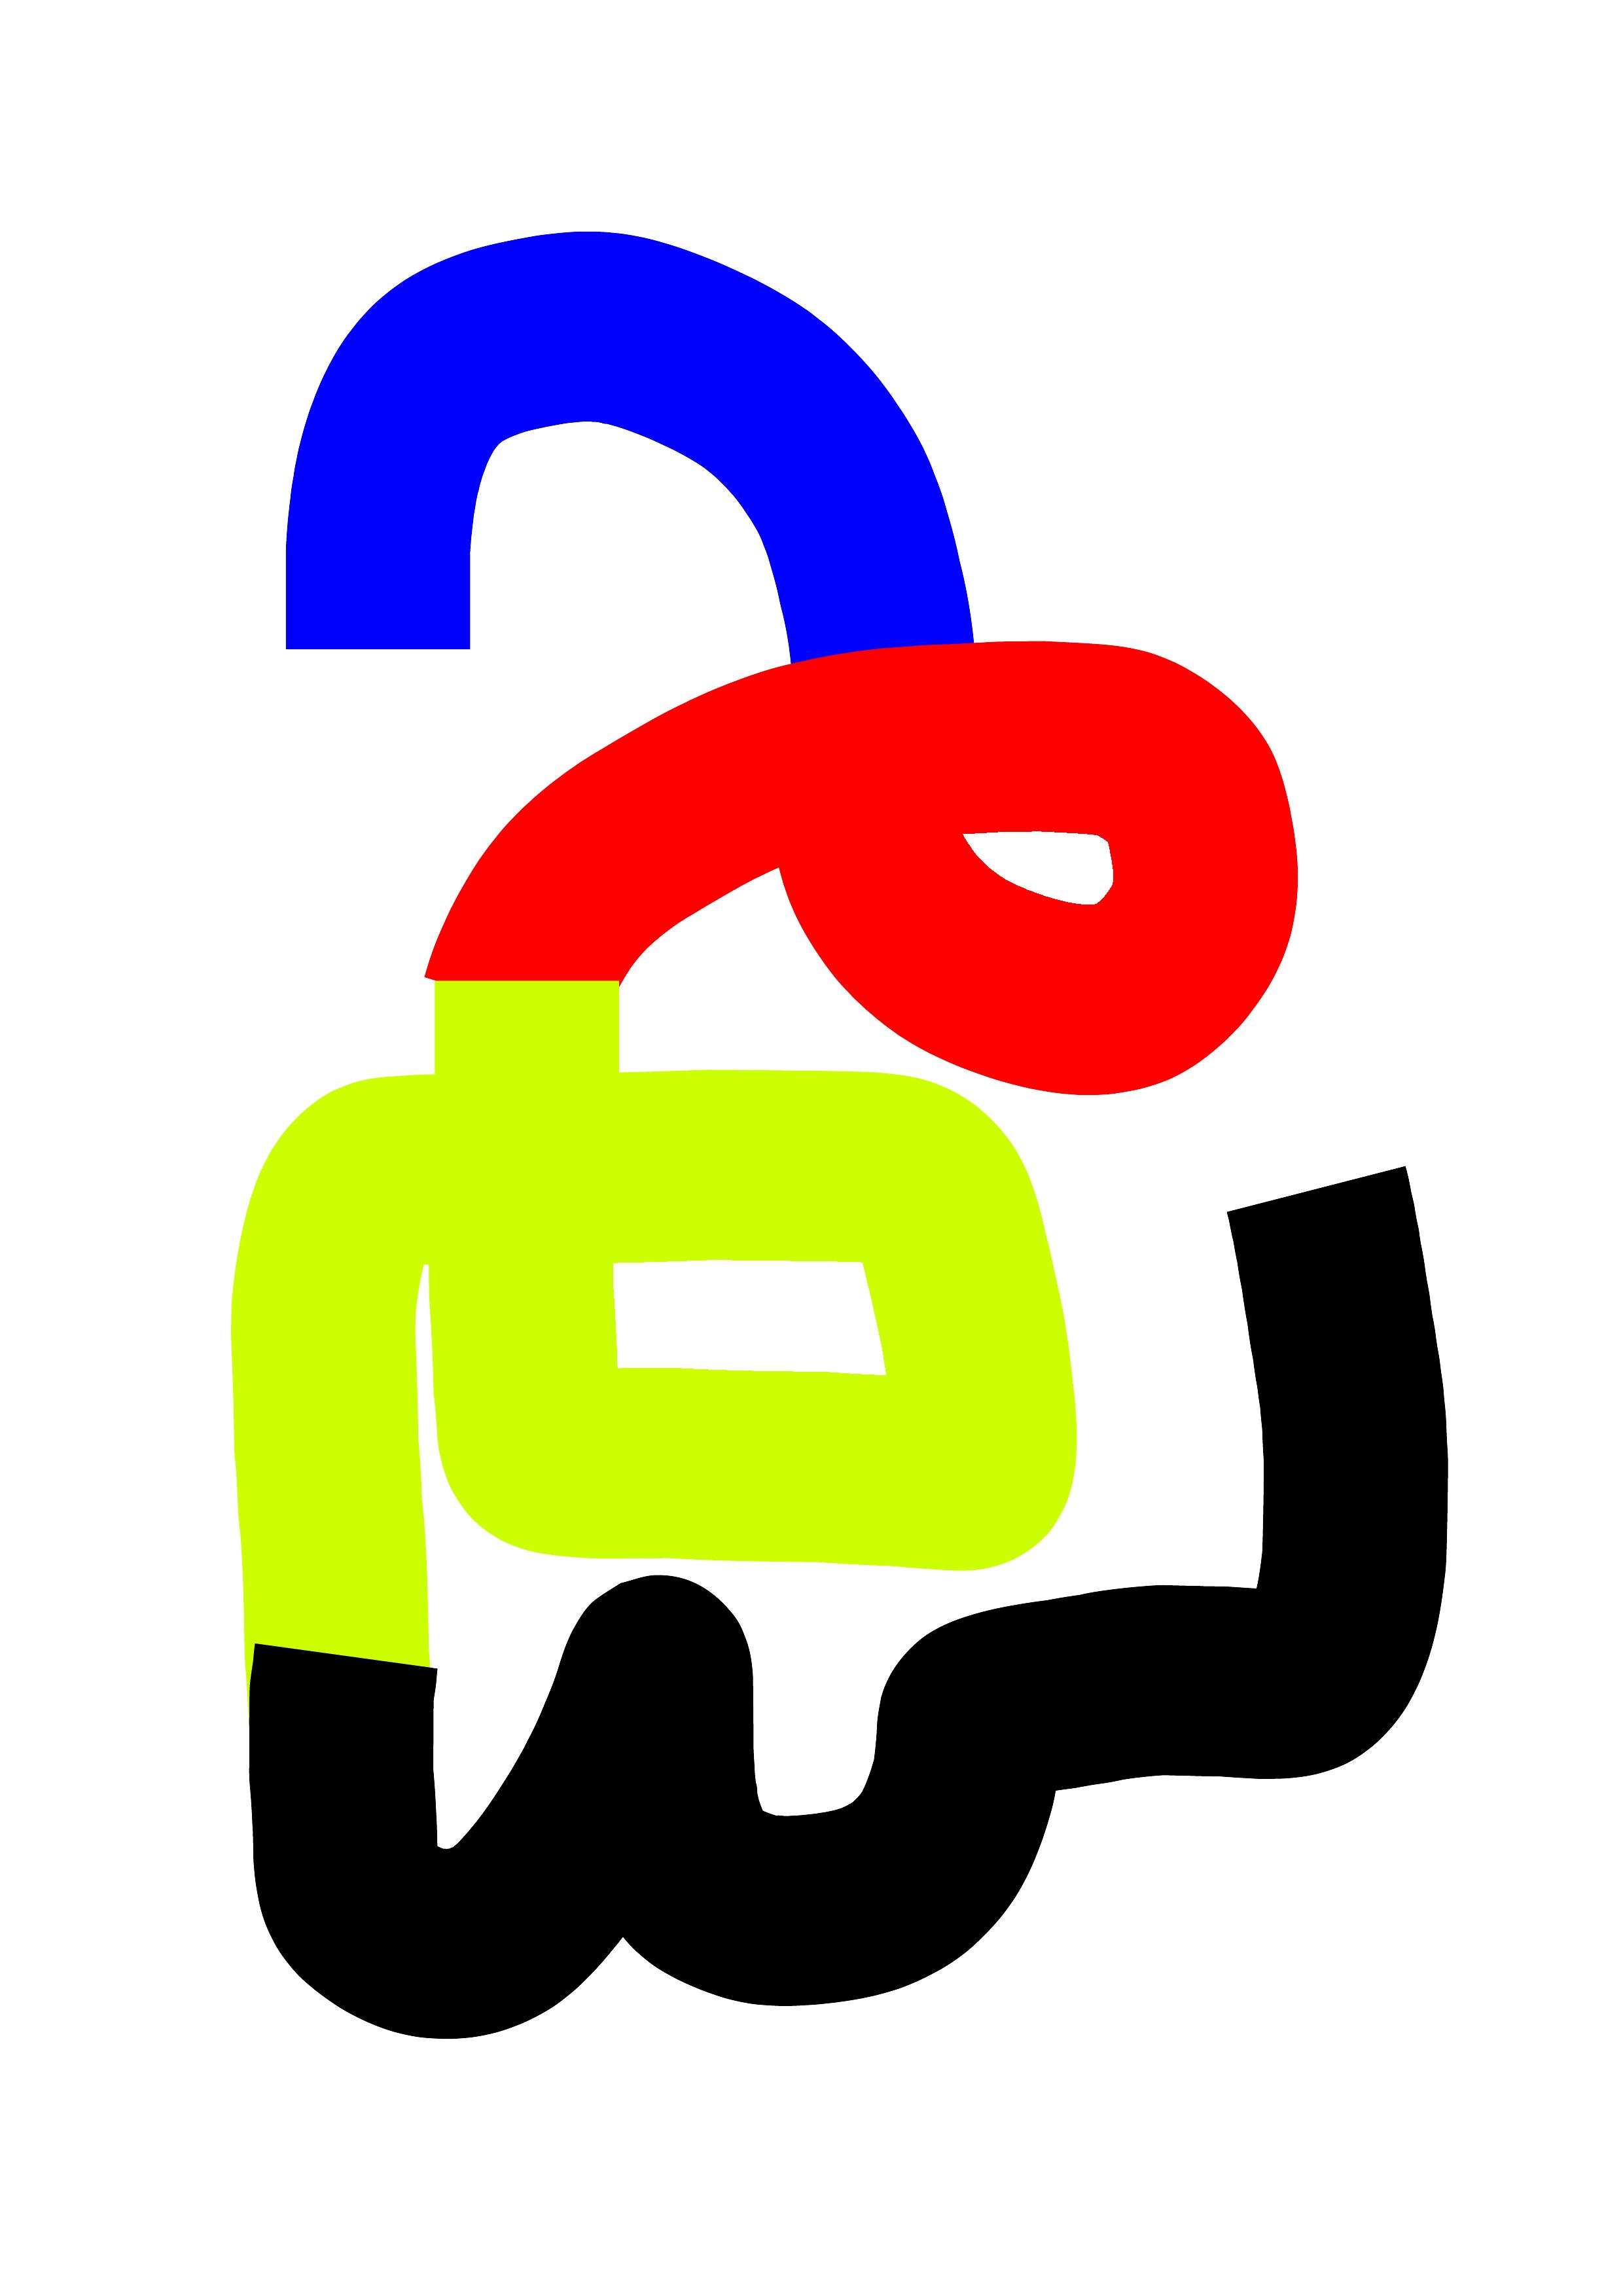 Lightlanguage4.png